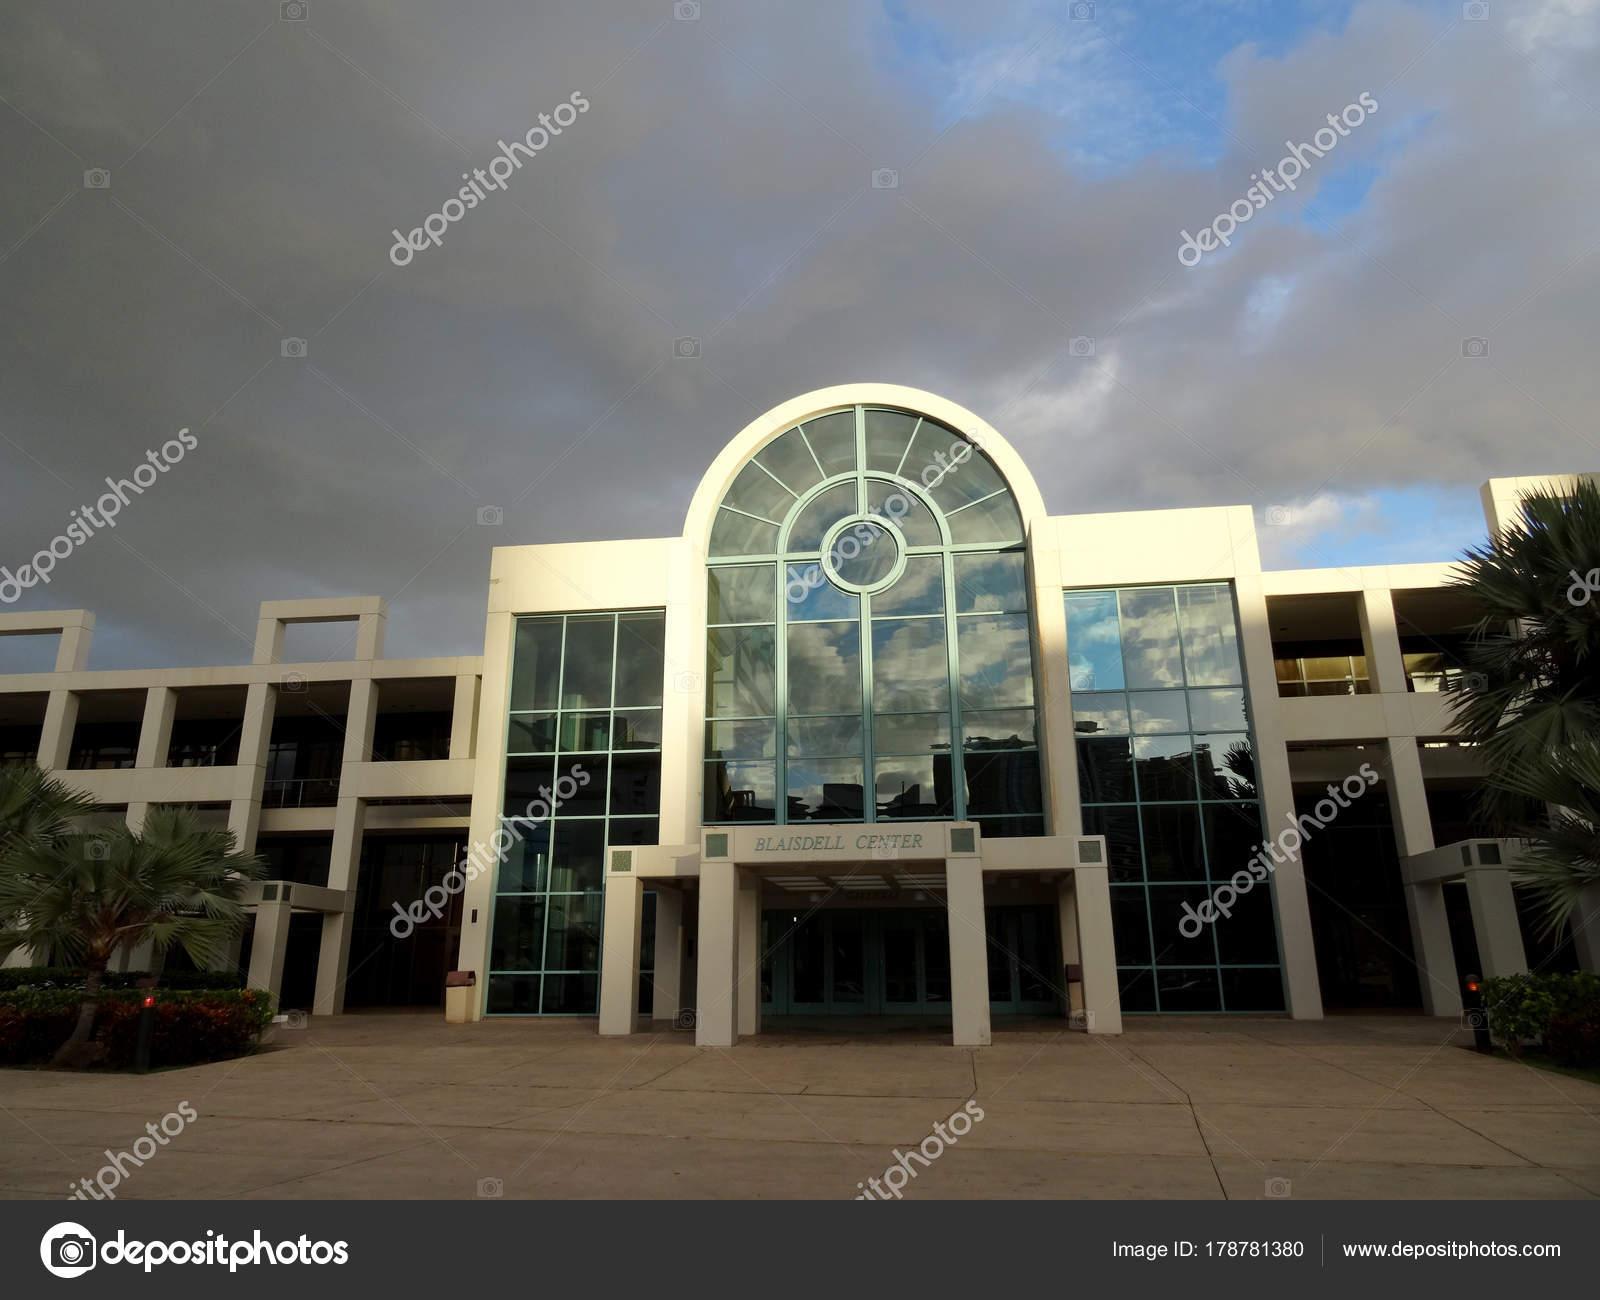 Contea Di Honolulu Hawaii neal s. blaisdell center — foto editoriale stock © ericbvd